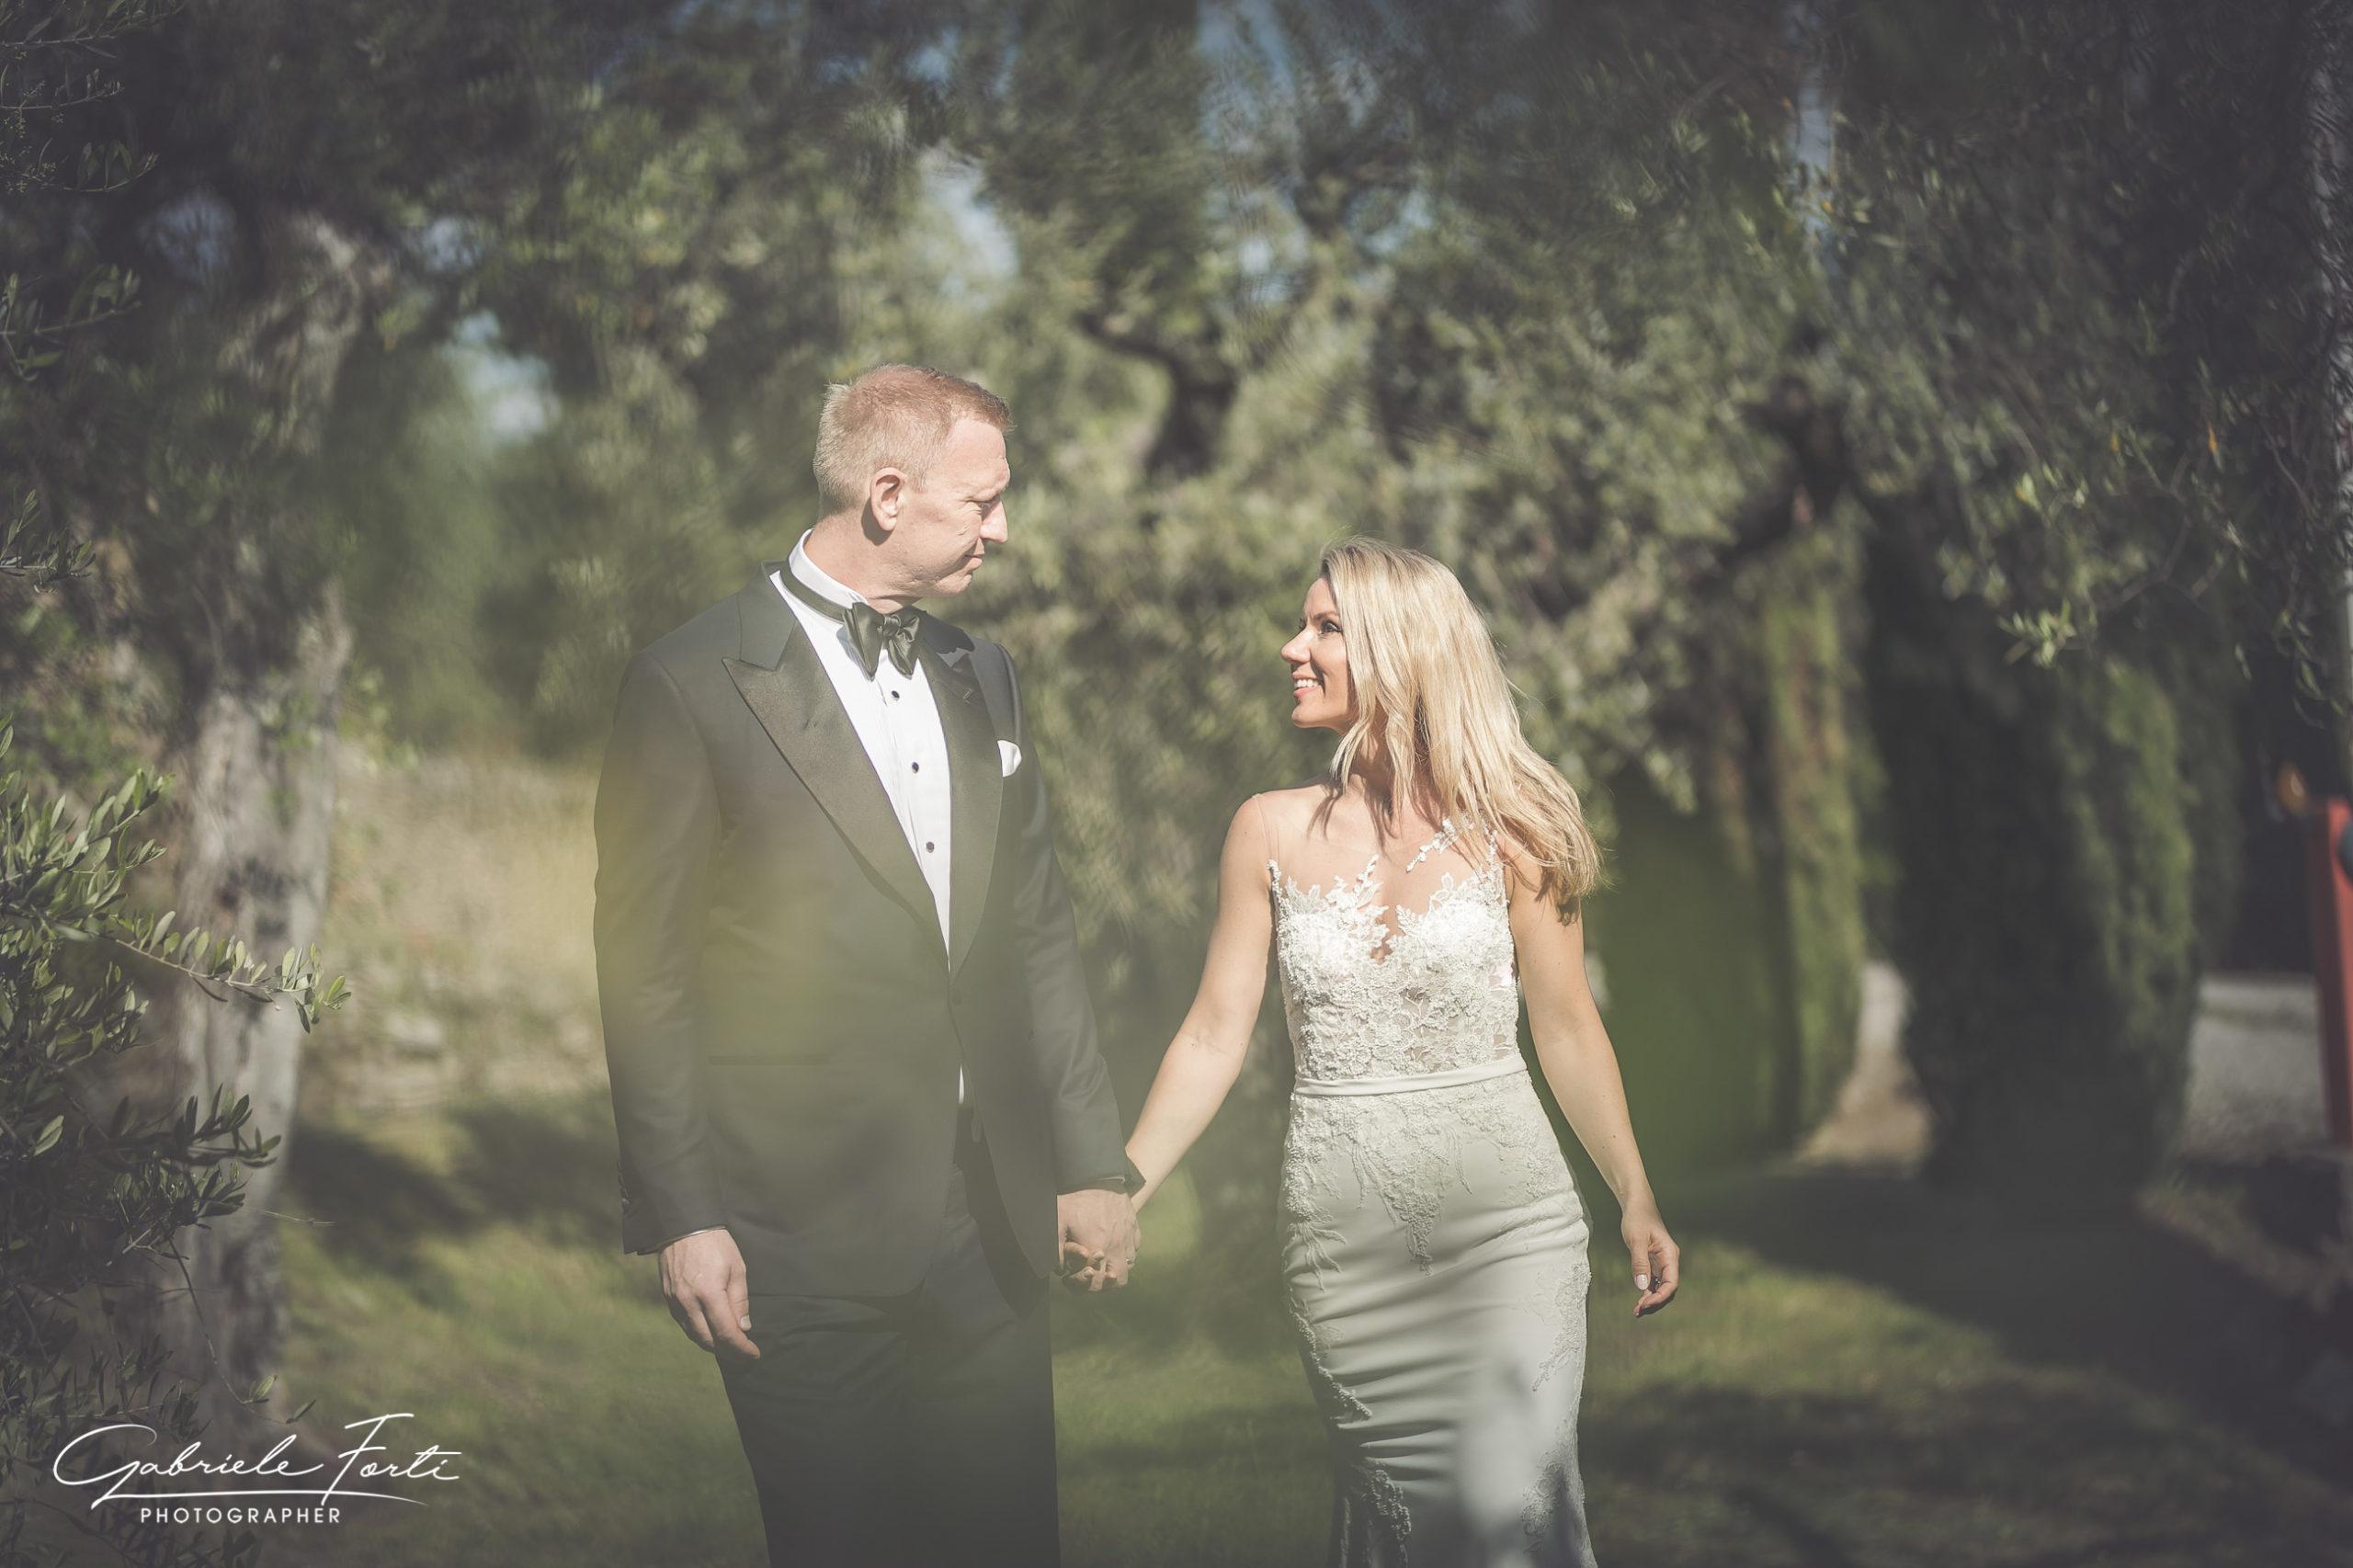 wedding-cortona-tuscany-italy-photographer-foto-forti-gabriele-55